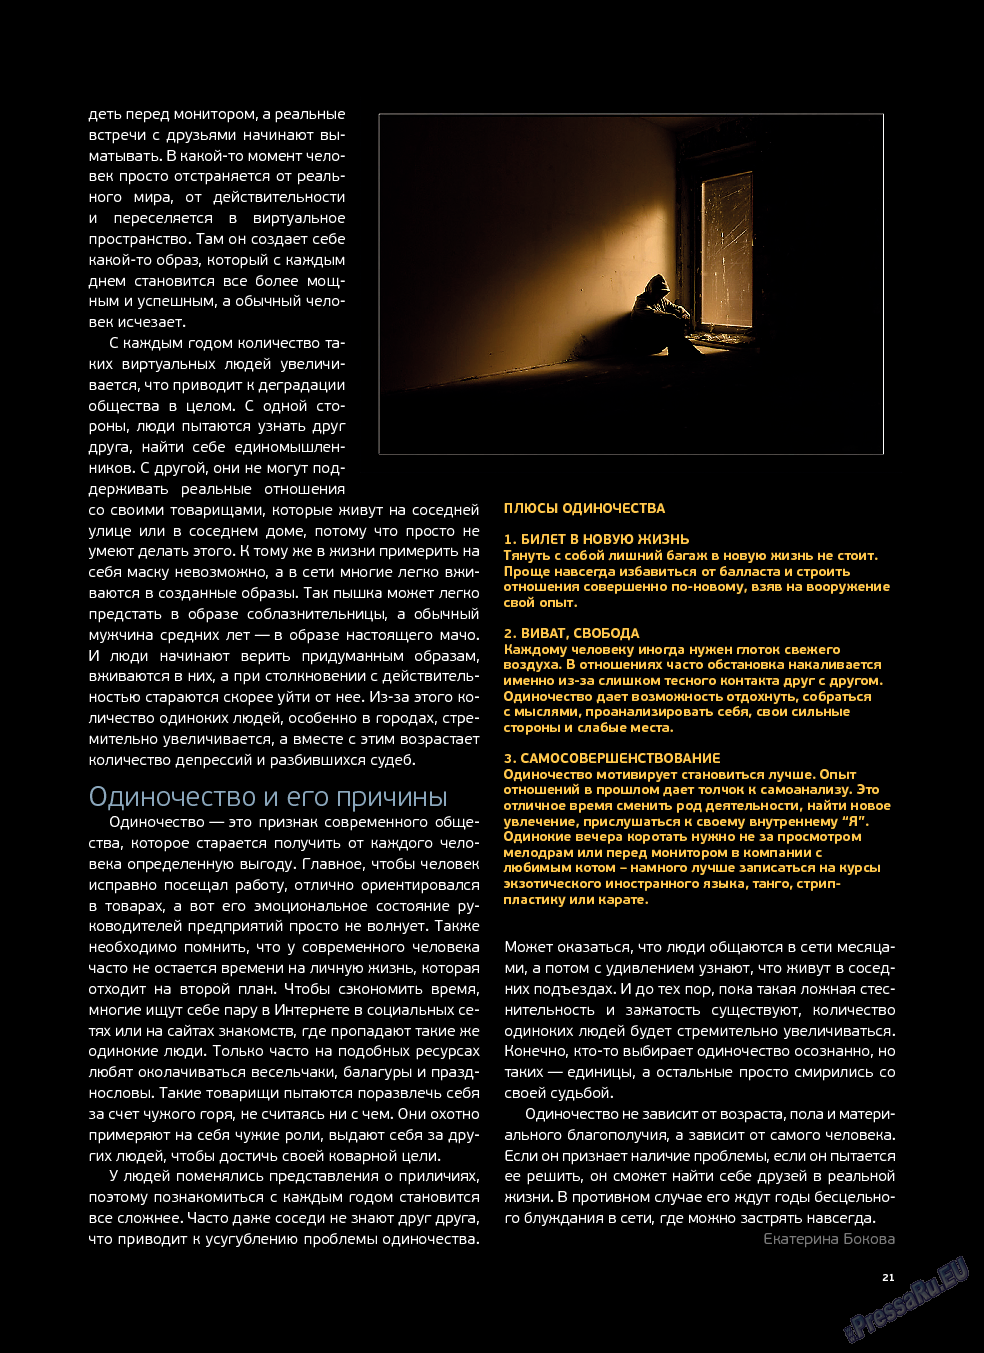 Артек (журнал). 2013 год, номер 5, стр. 23